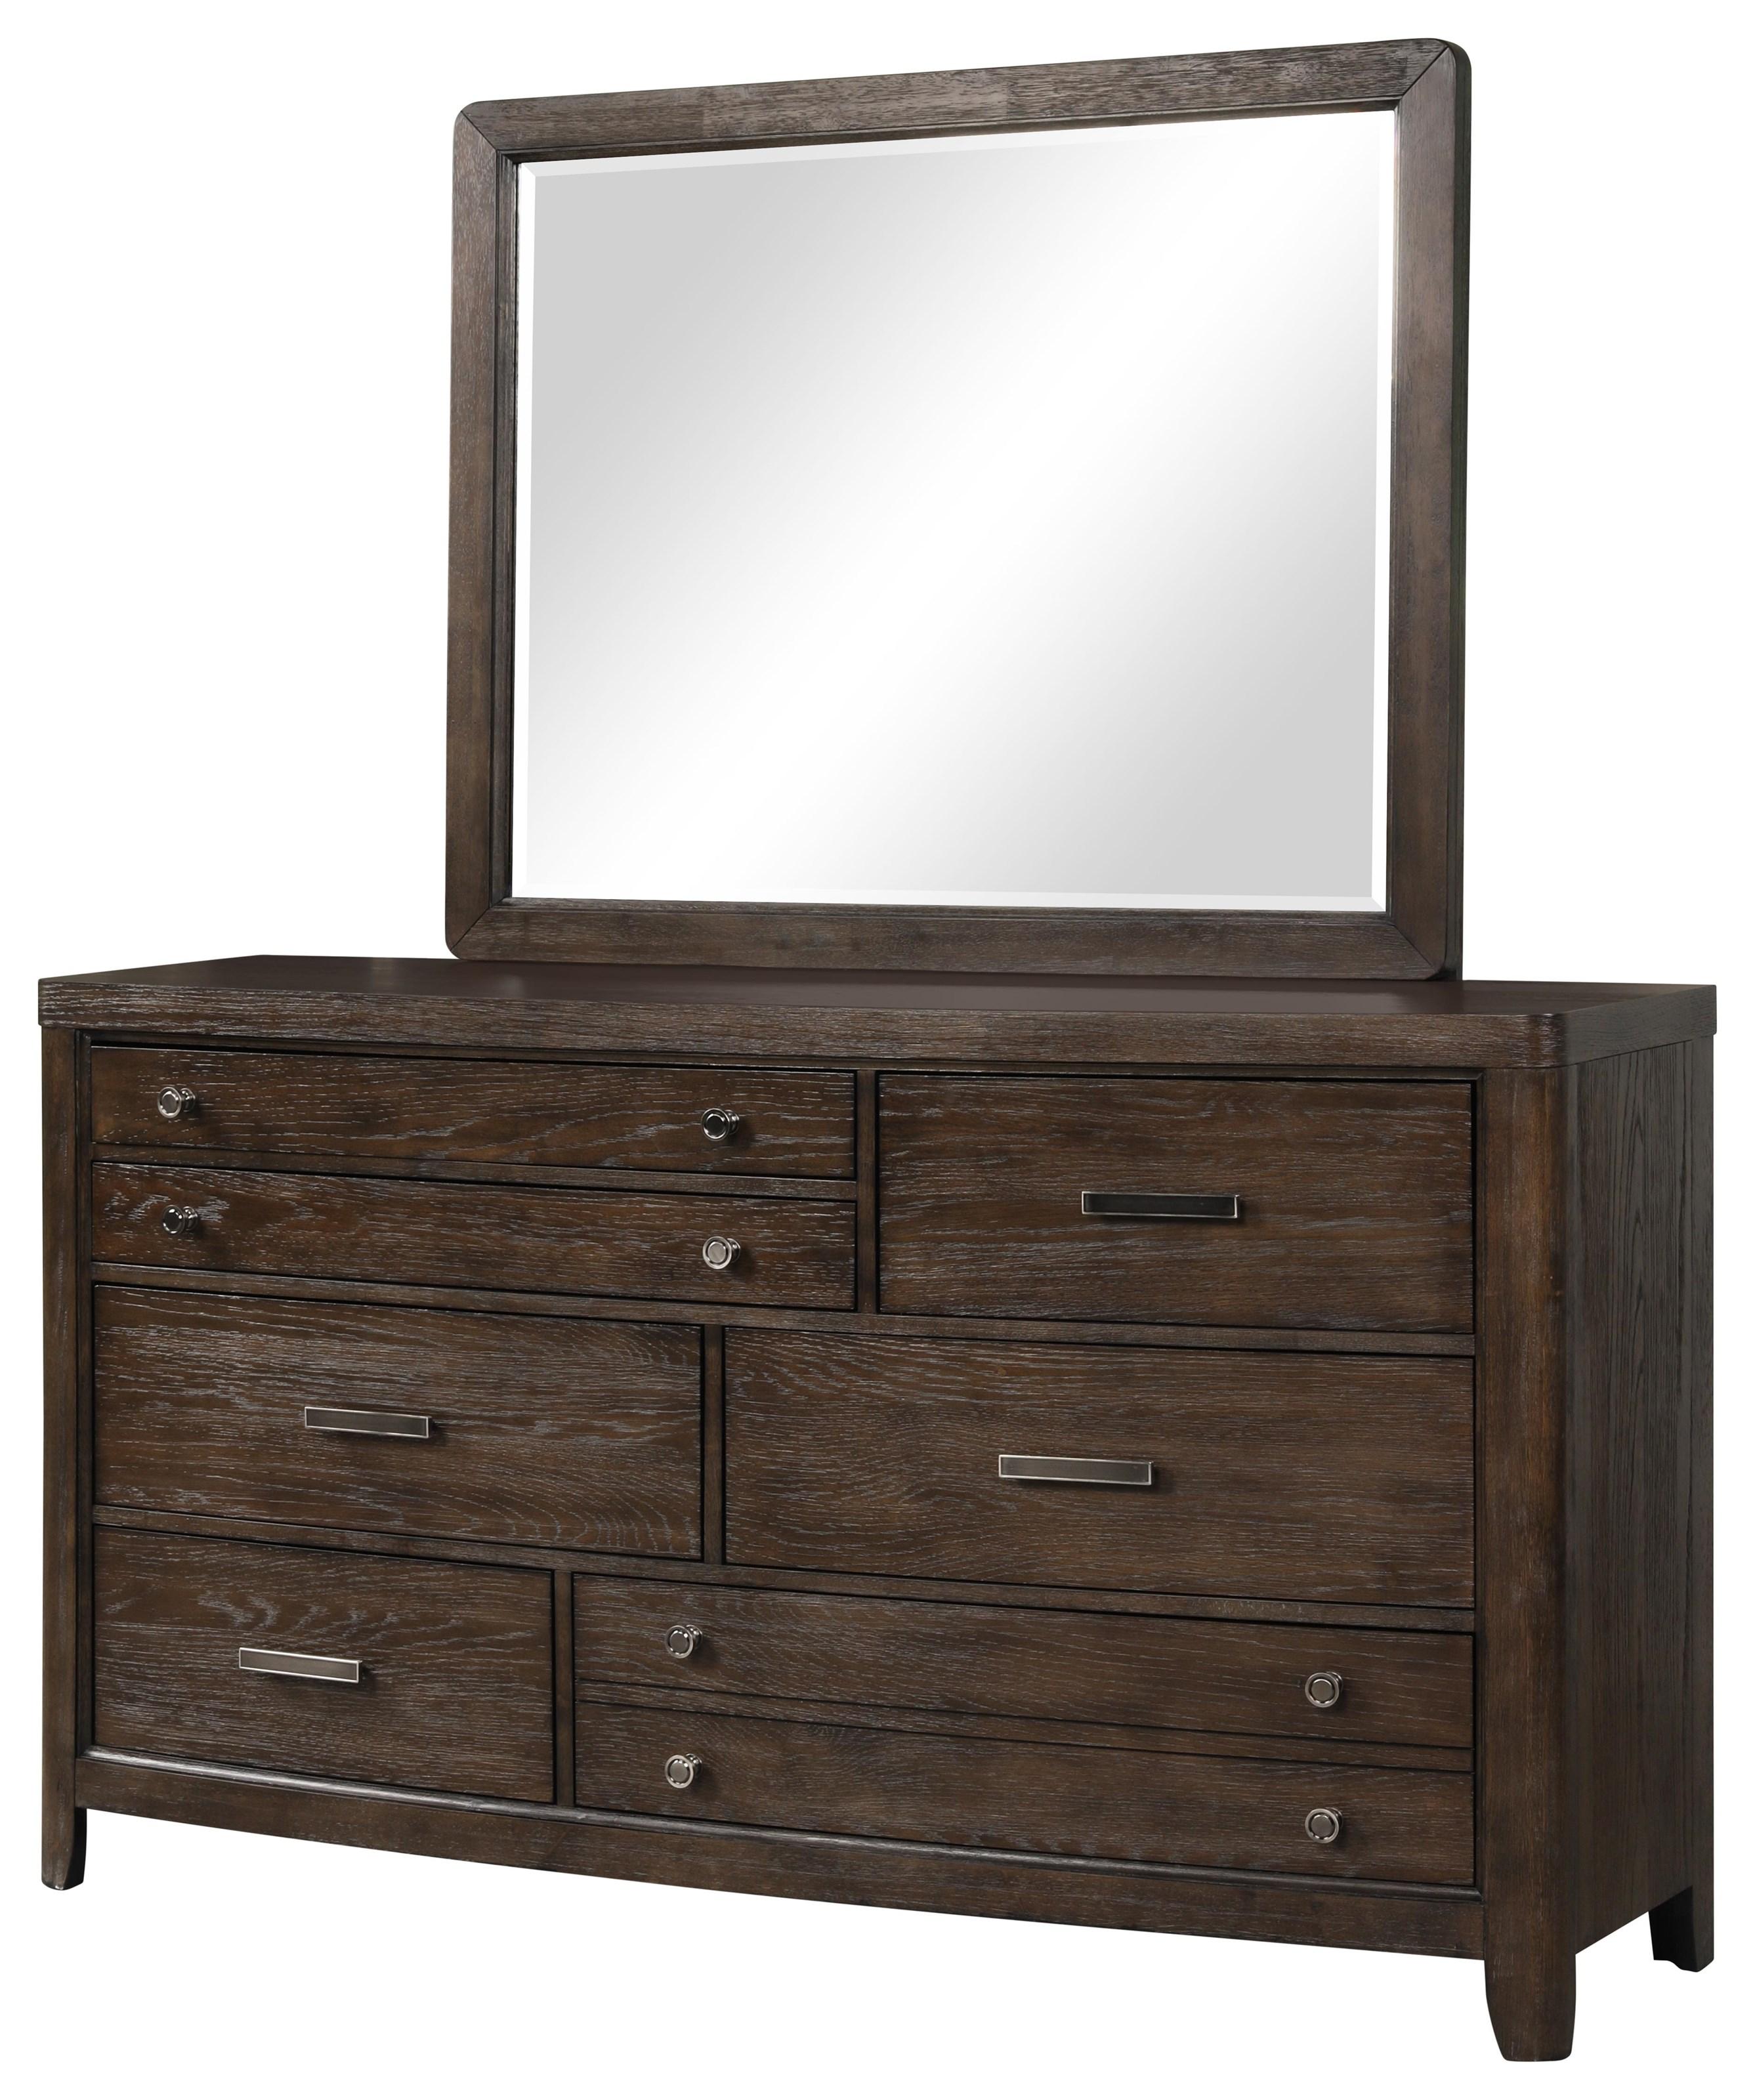 Fulton Mirror by Bernards at Darvin Furniture